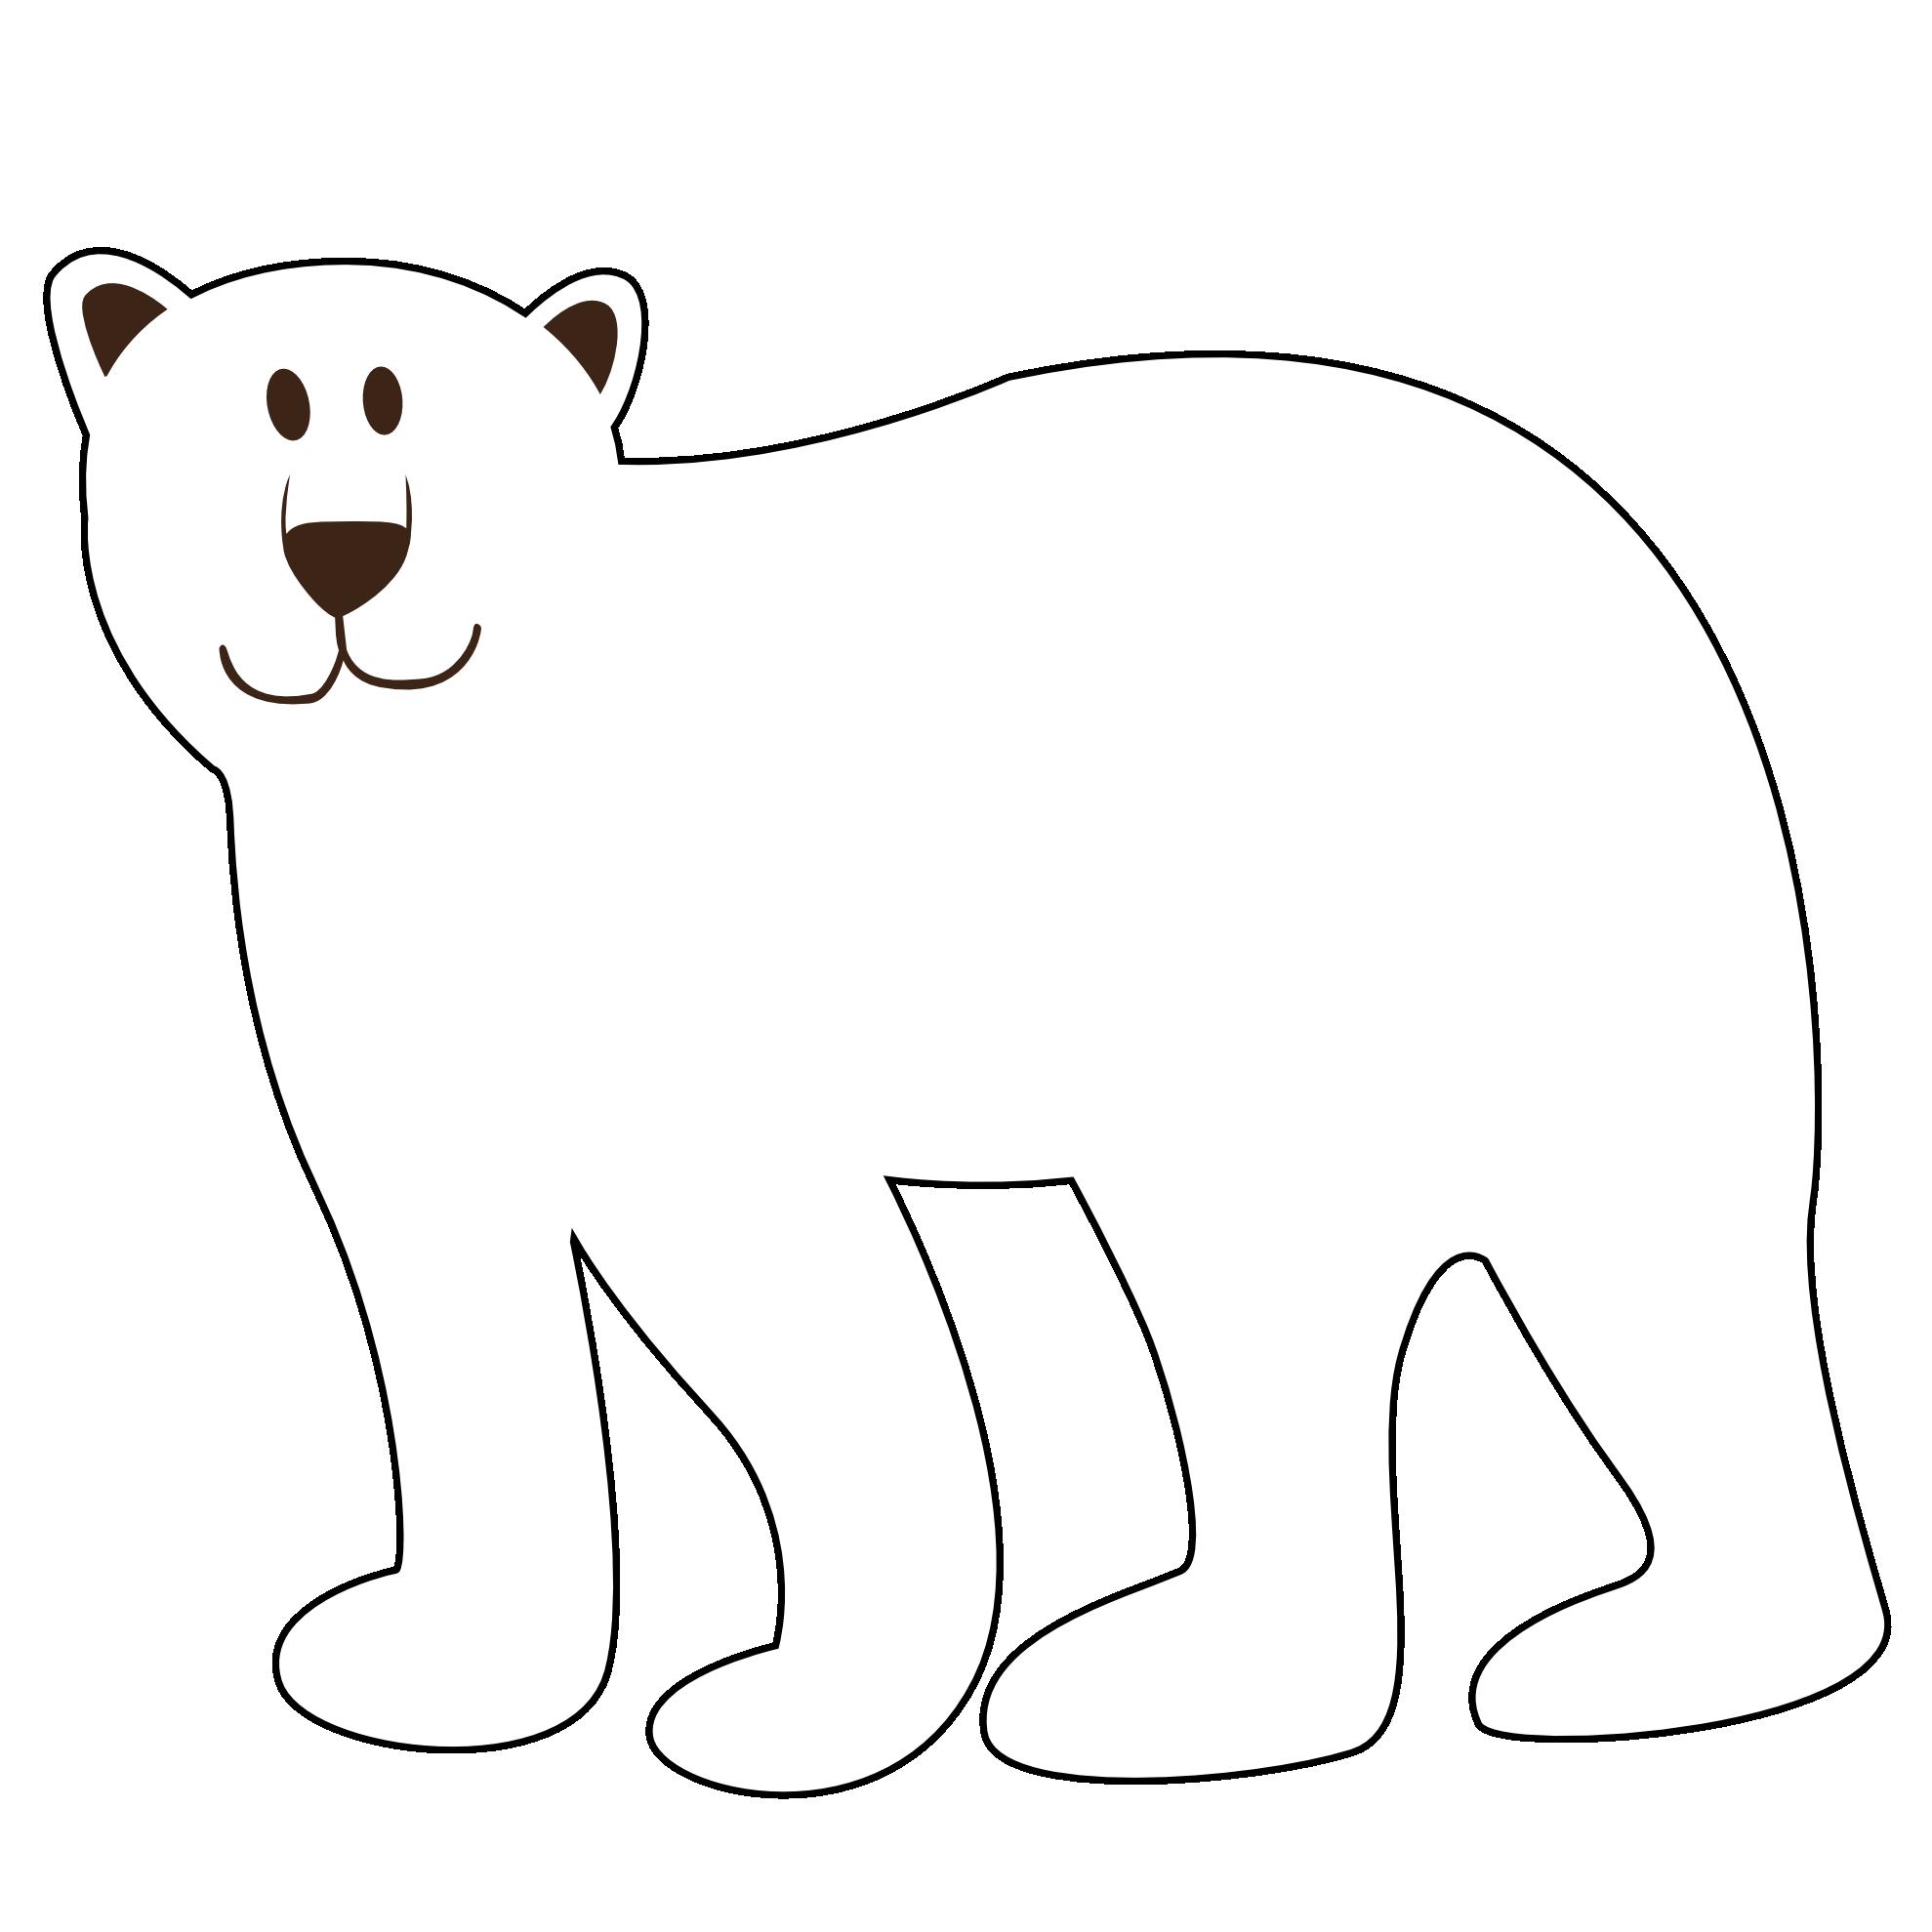 Polar bear clip art. Groundhog clipart coloring page